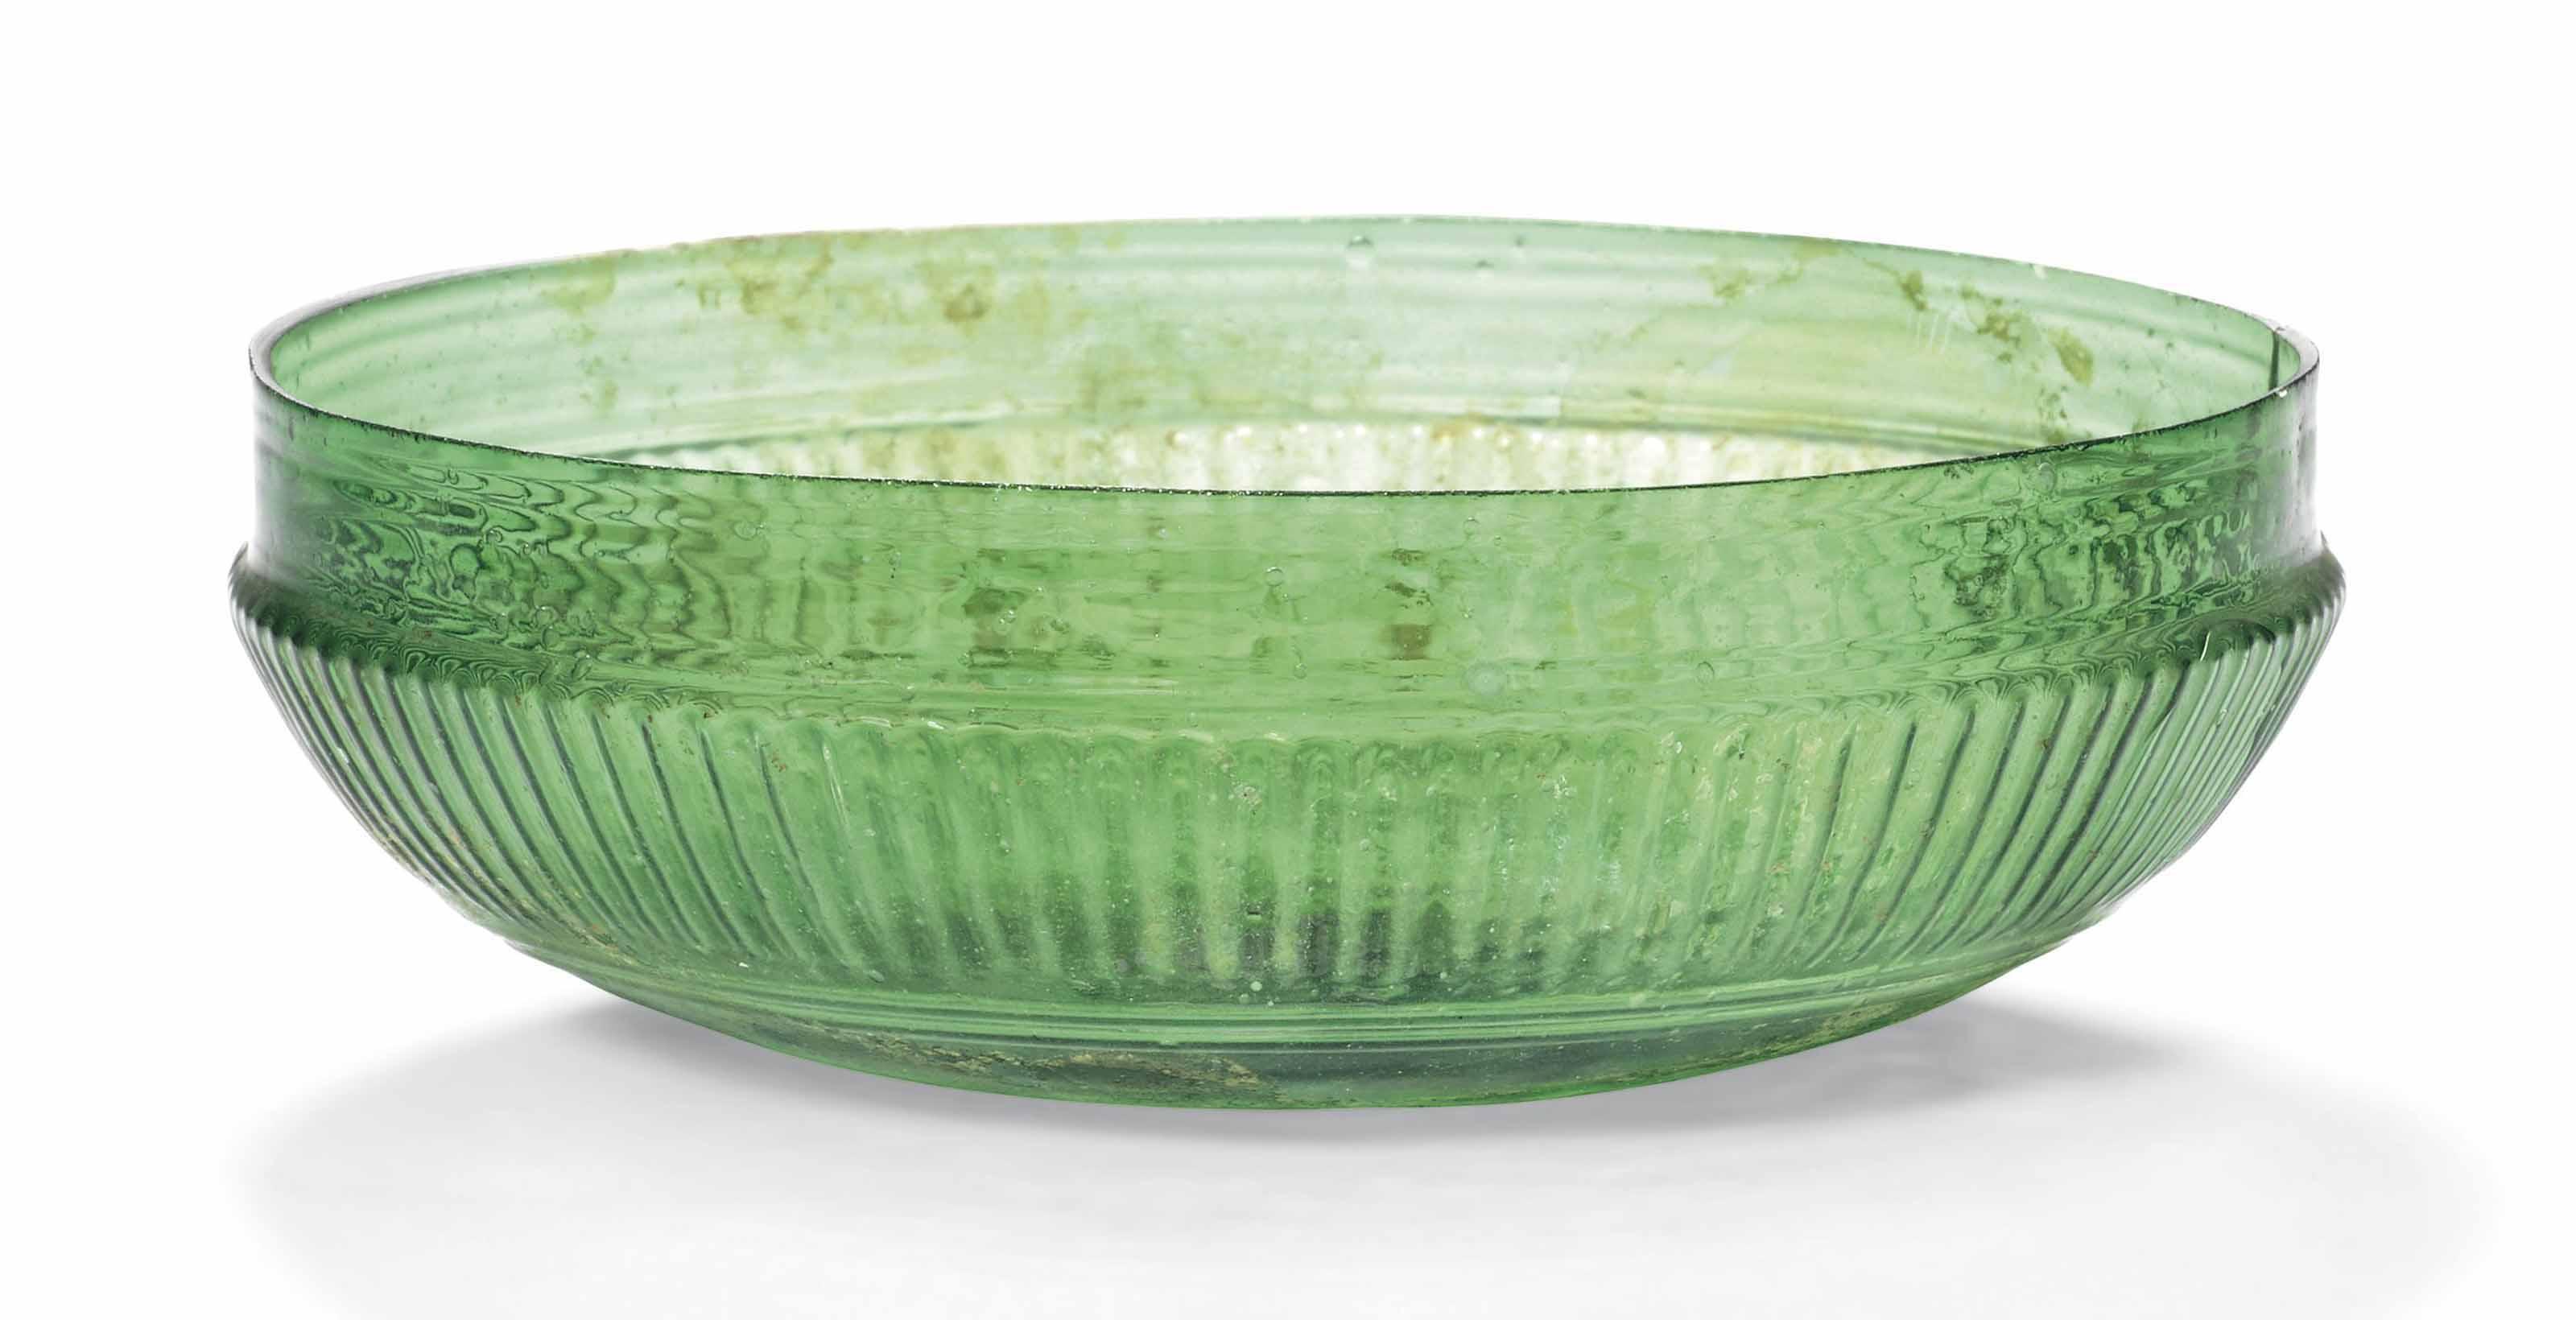 A ROMAN EMERALD GREEN GLASS RI